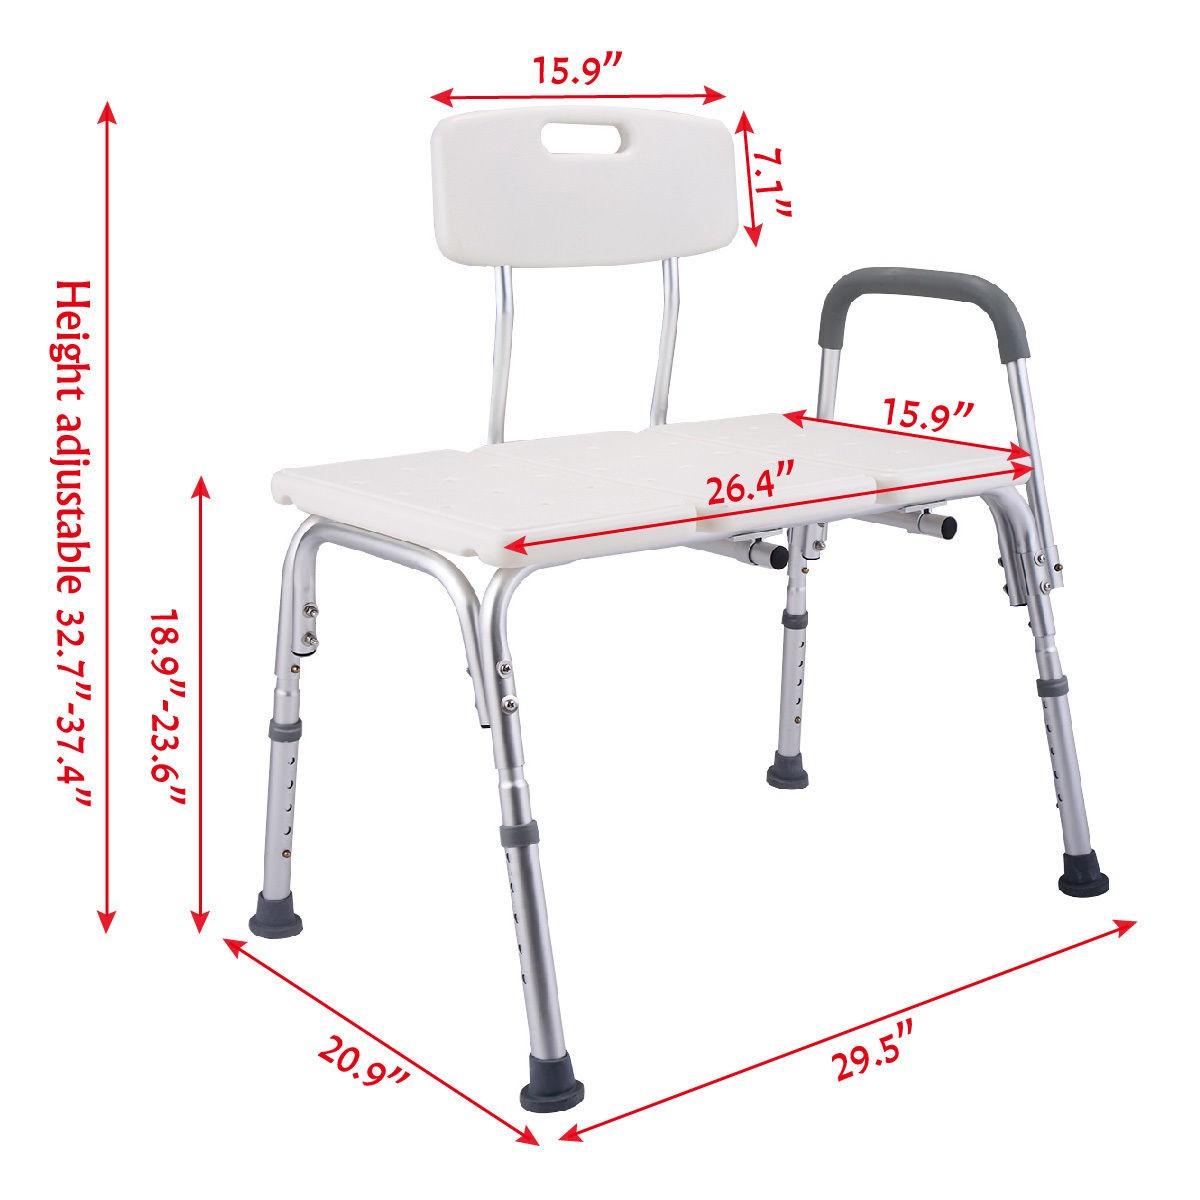 10 Height Adjustable Medical Shower Chair Bath Tub Bench